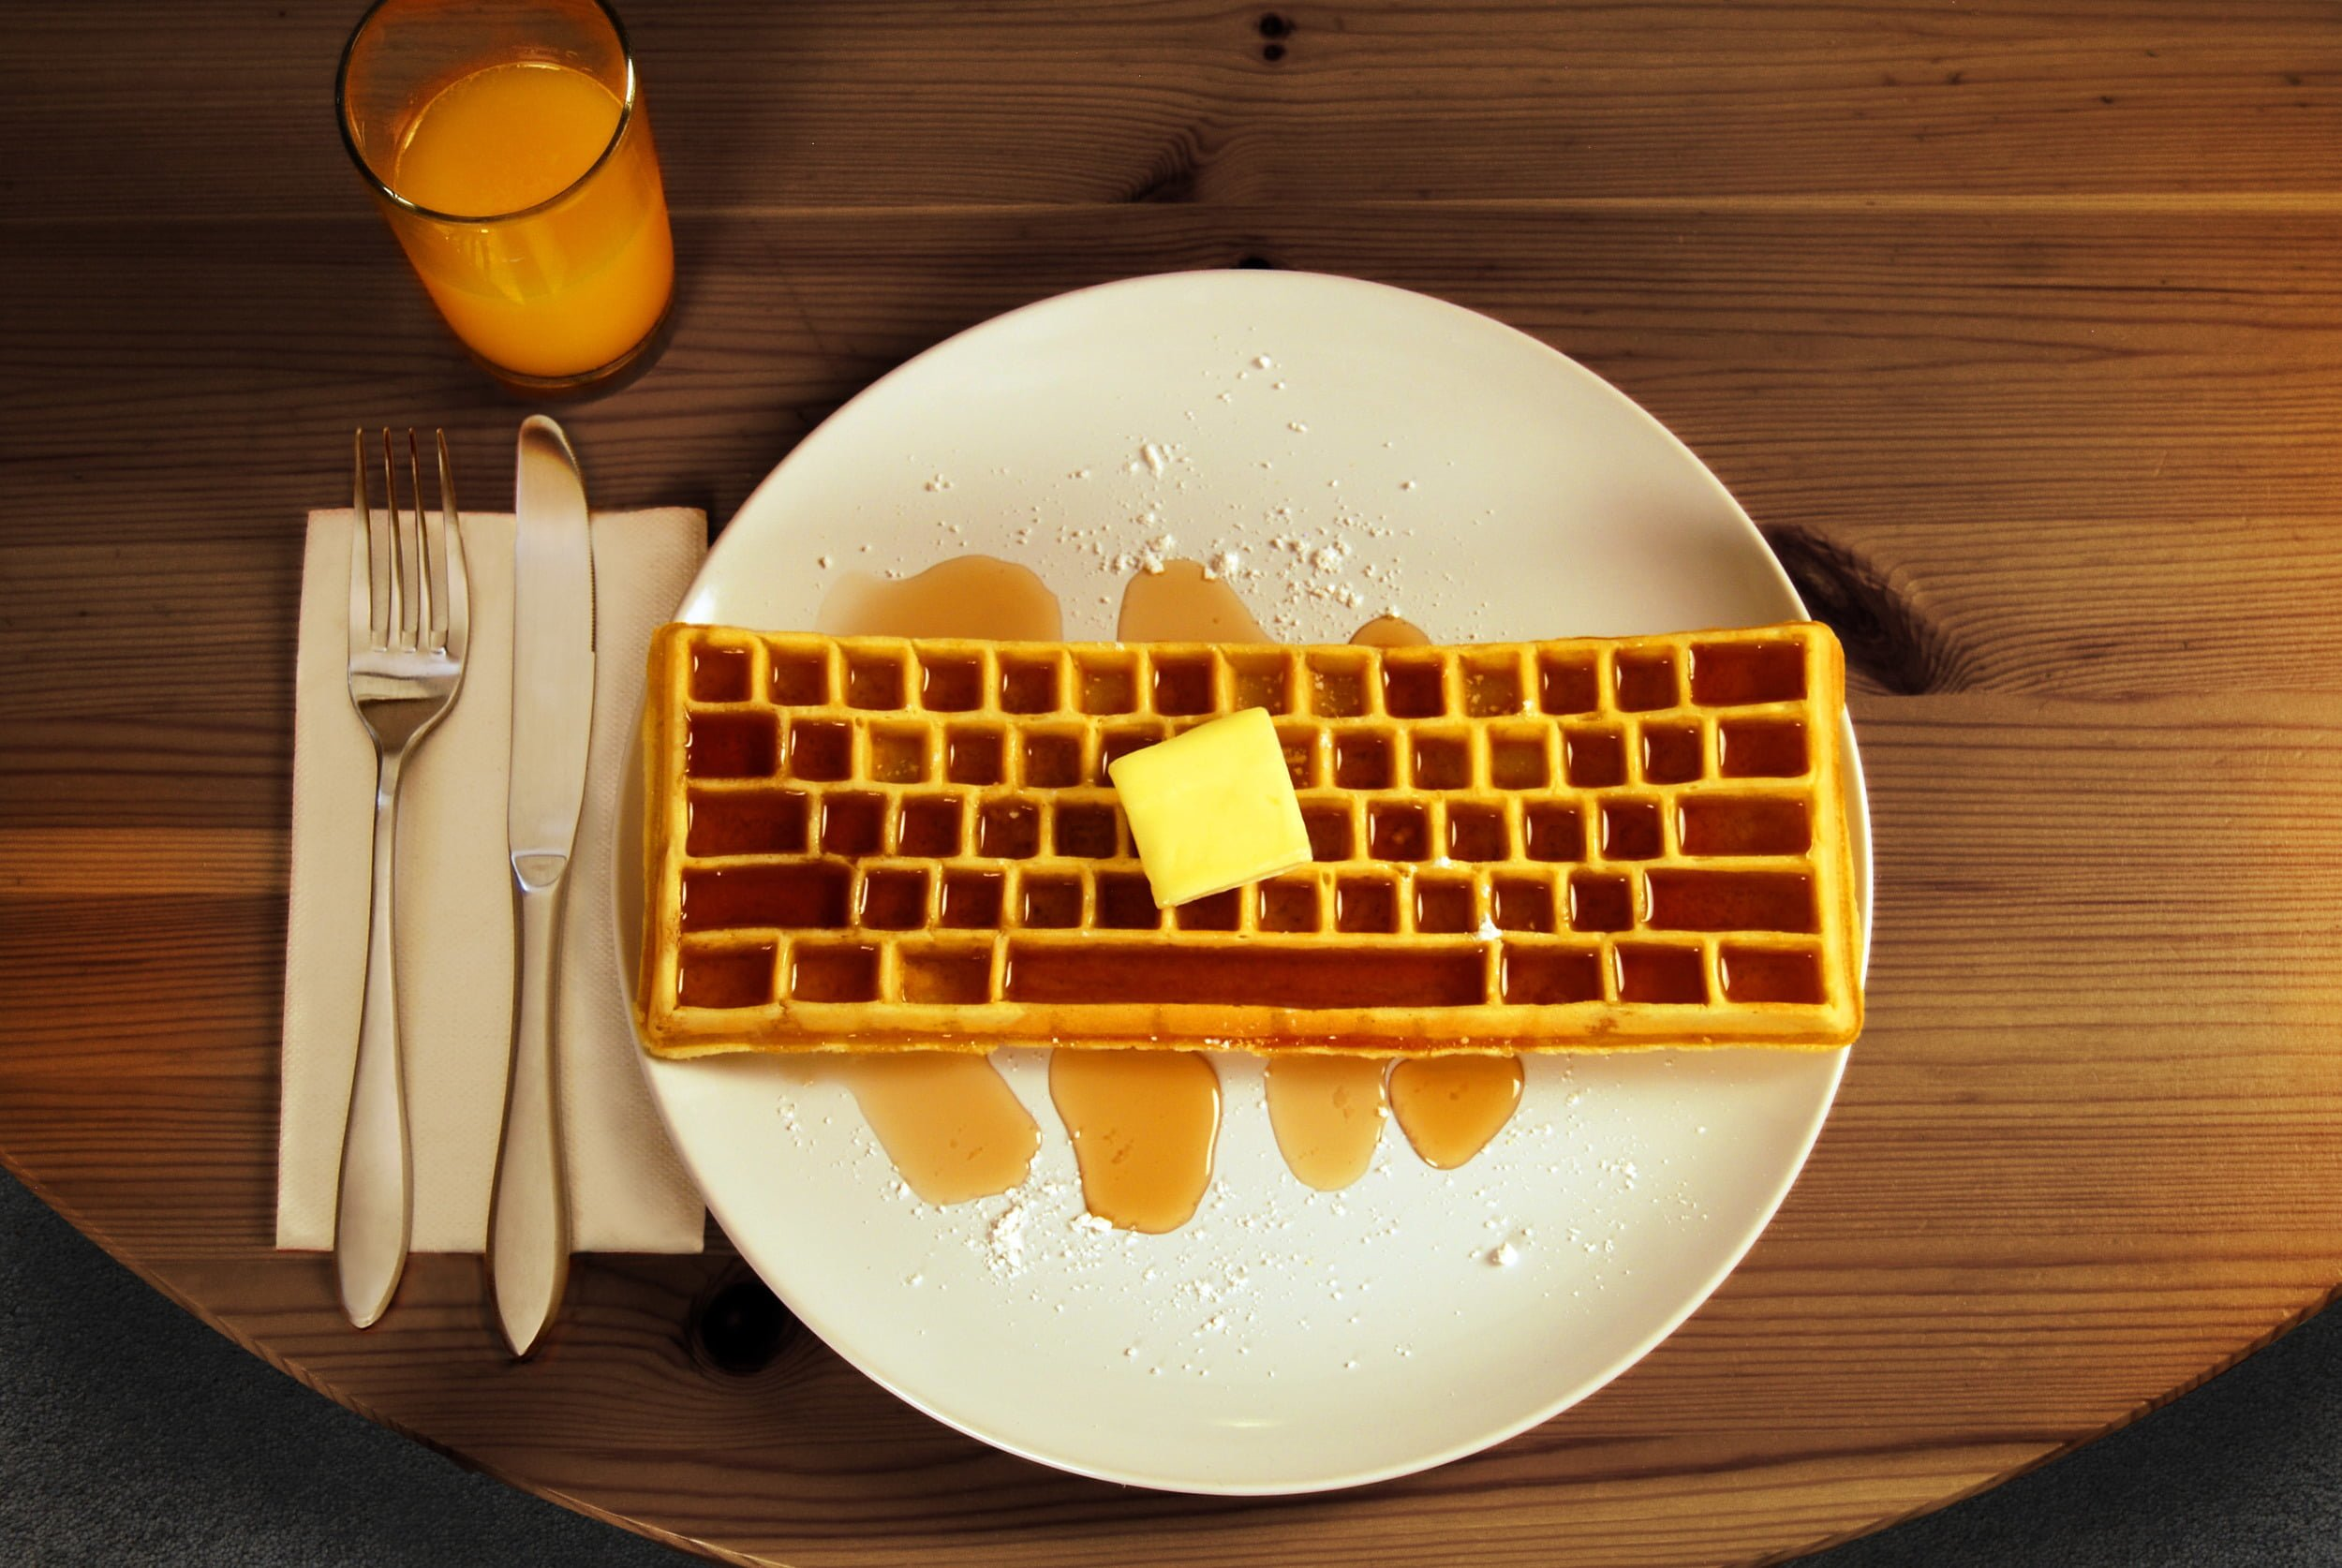 Keyboard_Waffle_Iron_Beauty_Food_Shot